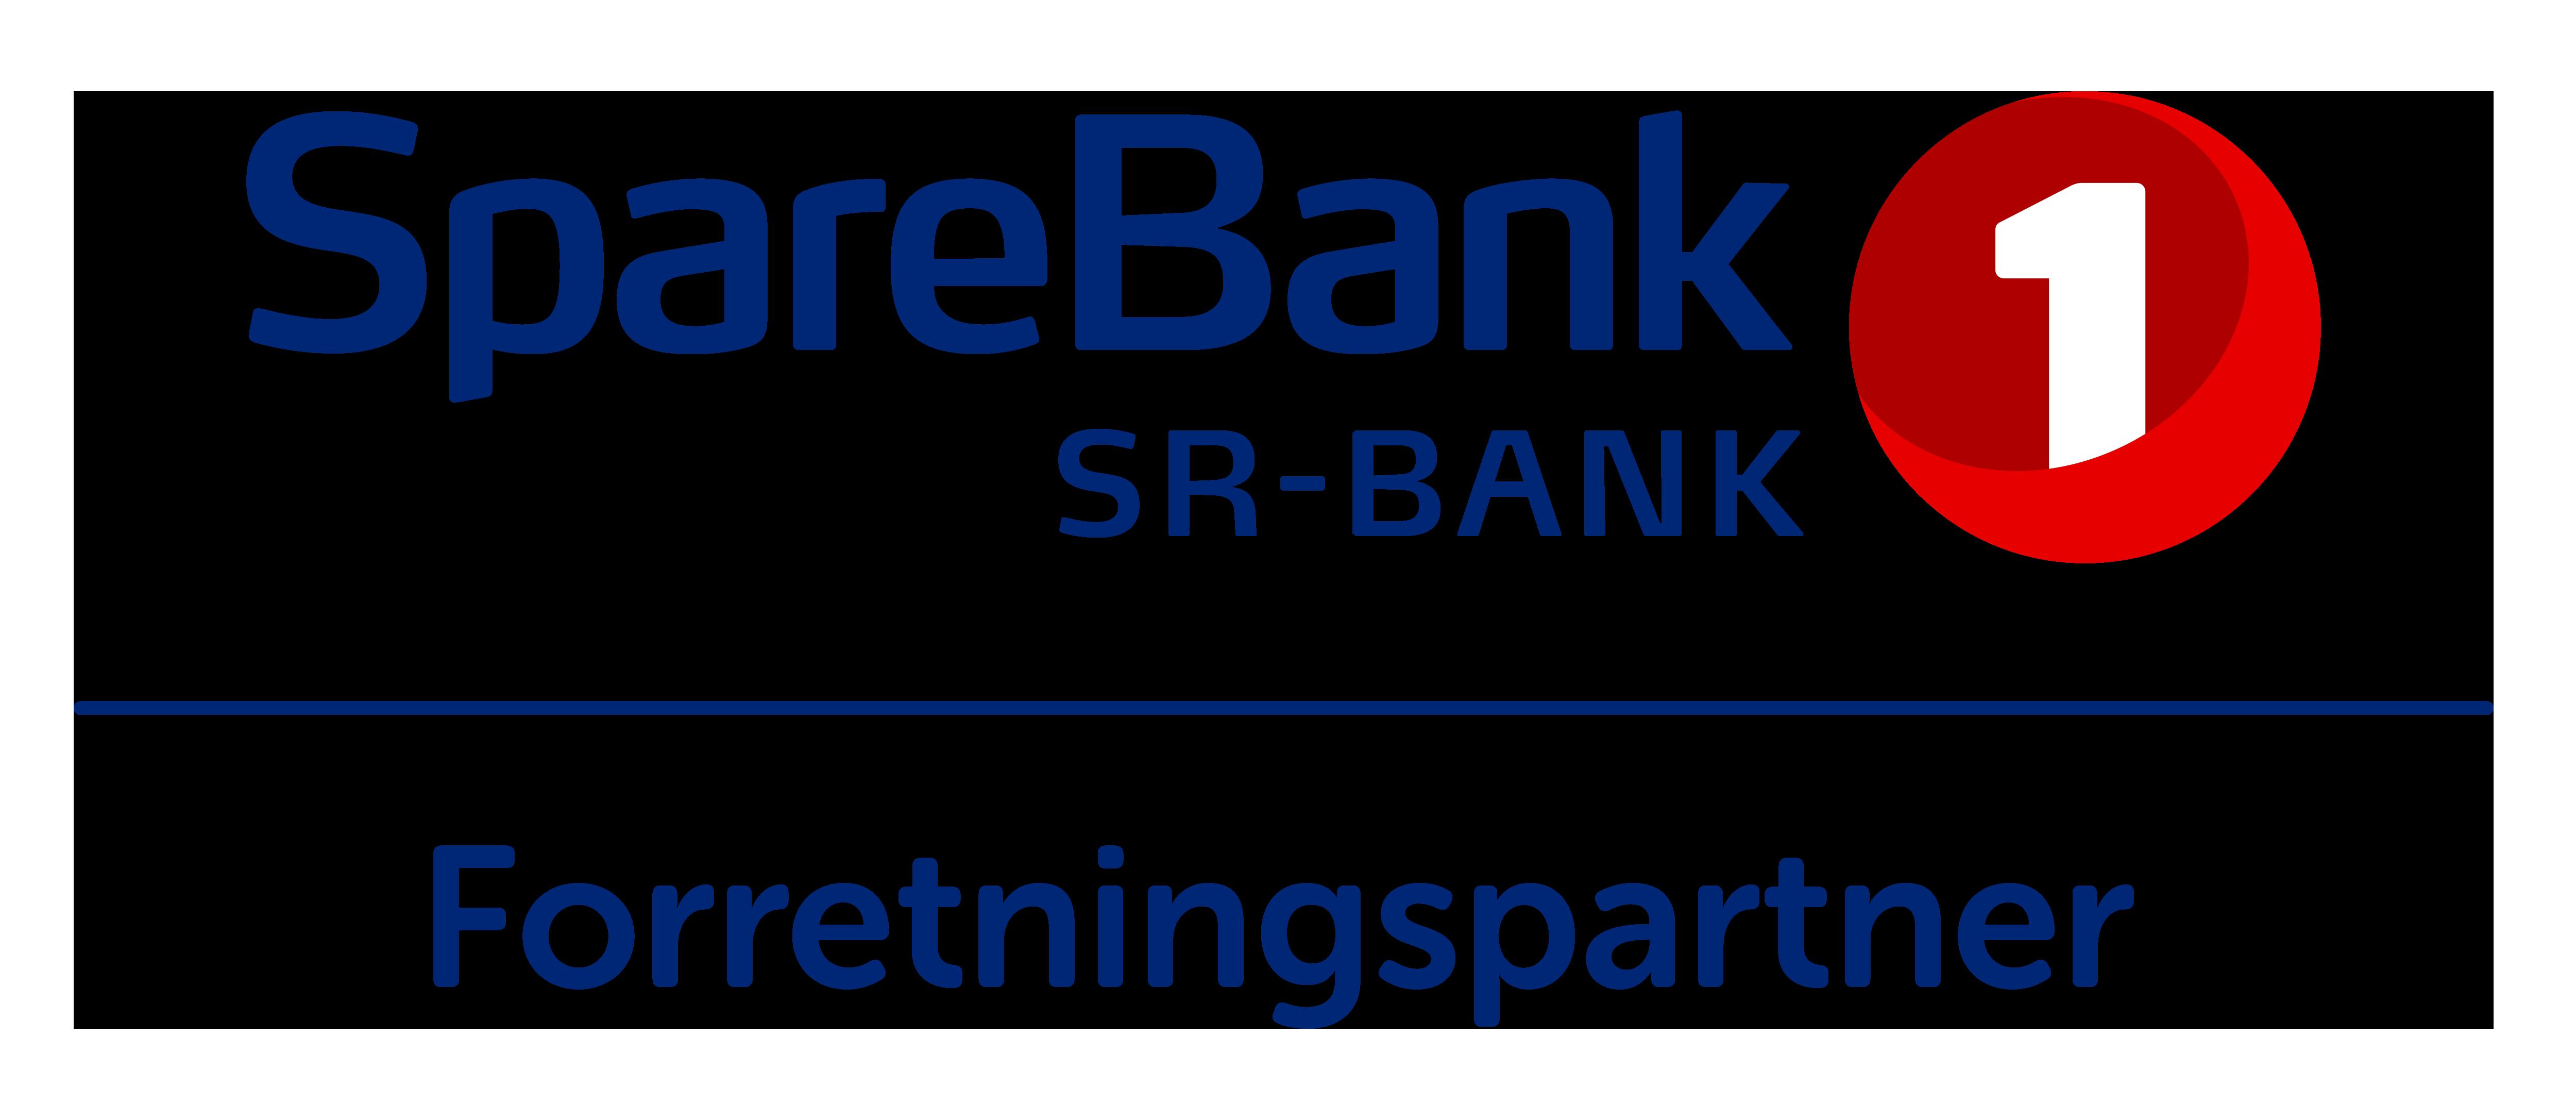 SpareBank SR_Bank Forretningspartner logo